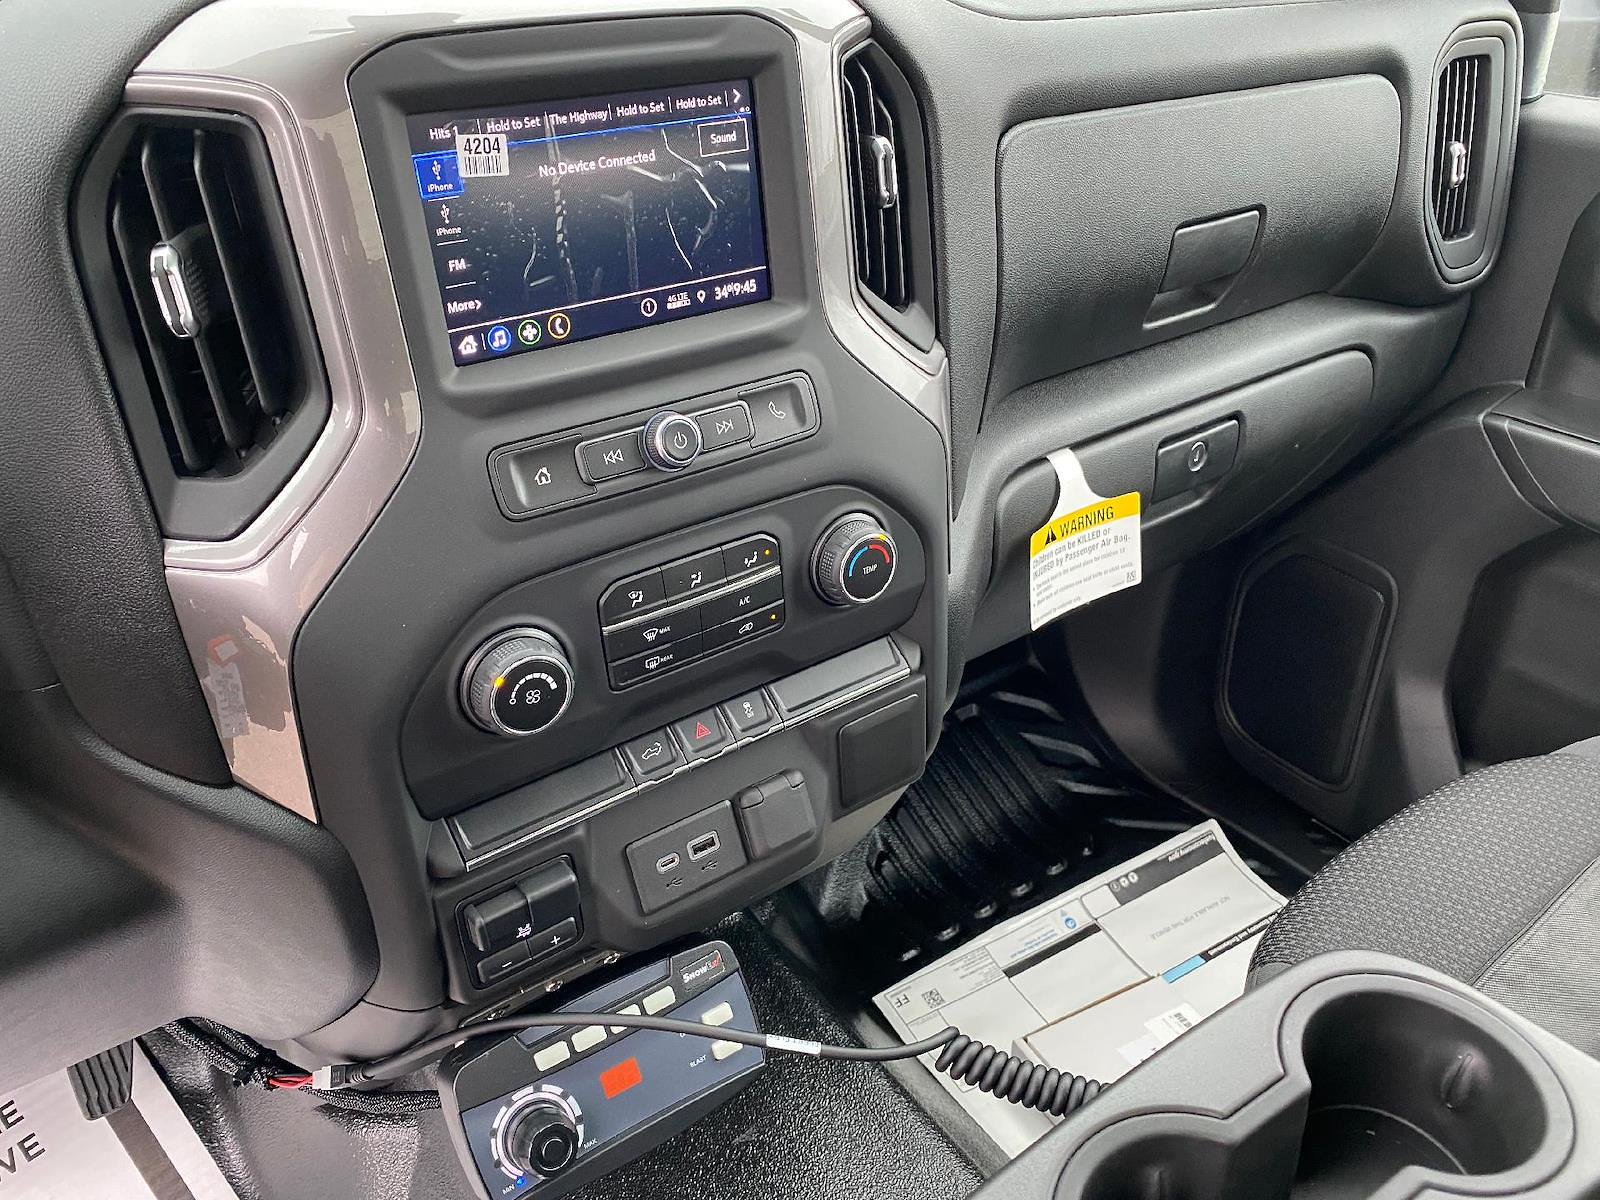 2021 Chevrolet Silverado 2500 Regular Cab 4x4, Pickup #89089 - photo 8